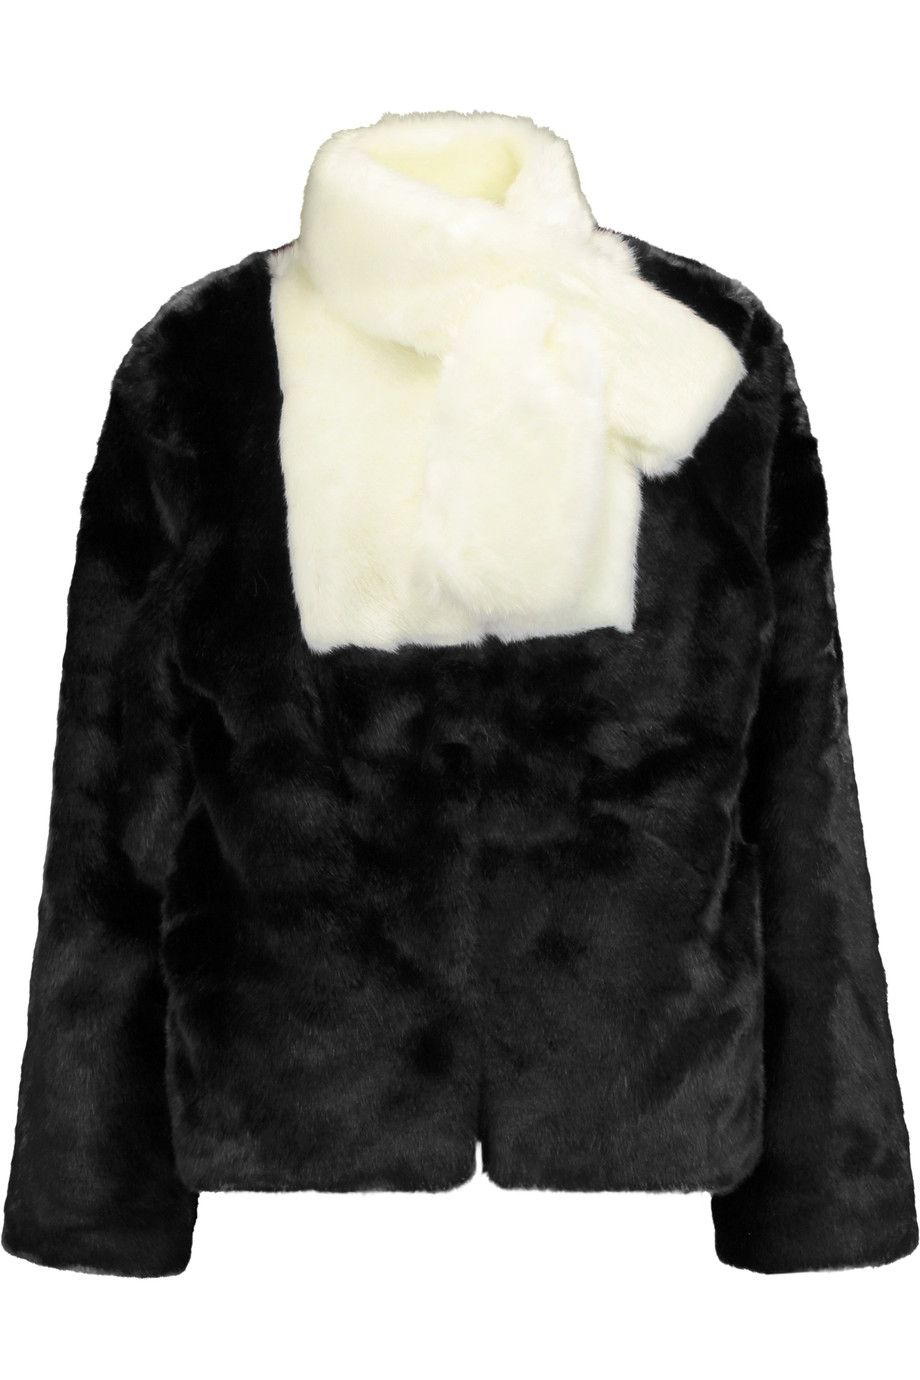 GOEN J Two-tone faux fur coat. #goenj #cloth #coat